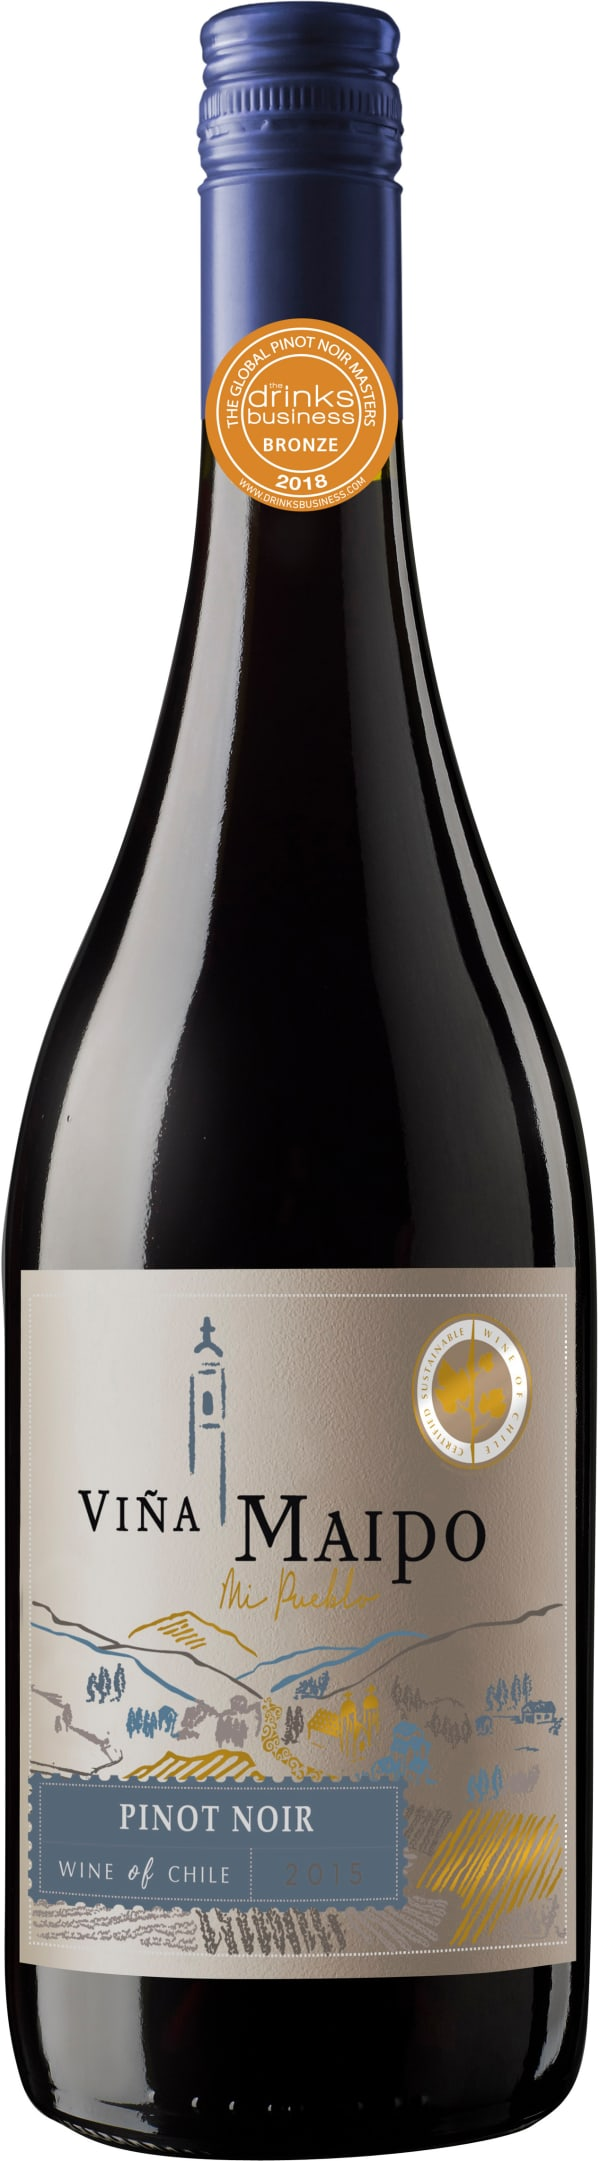 Viña Maipo Pinot Noir 2017